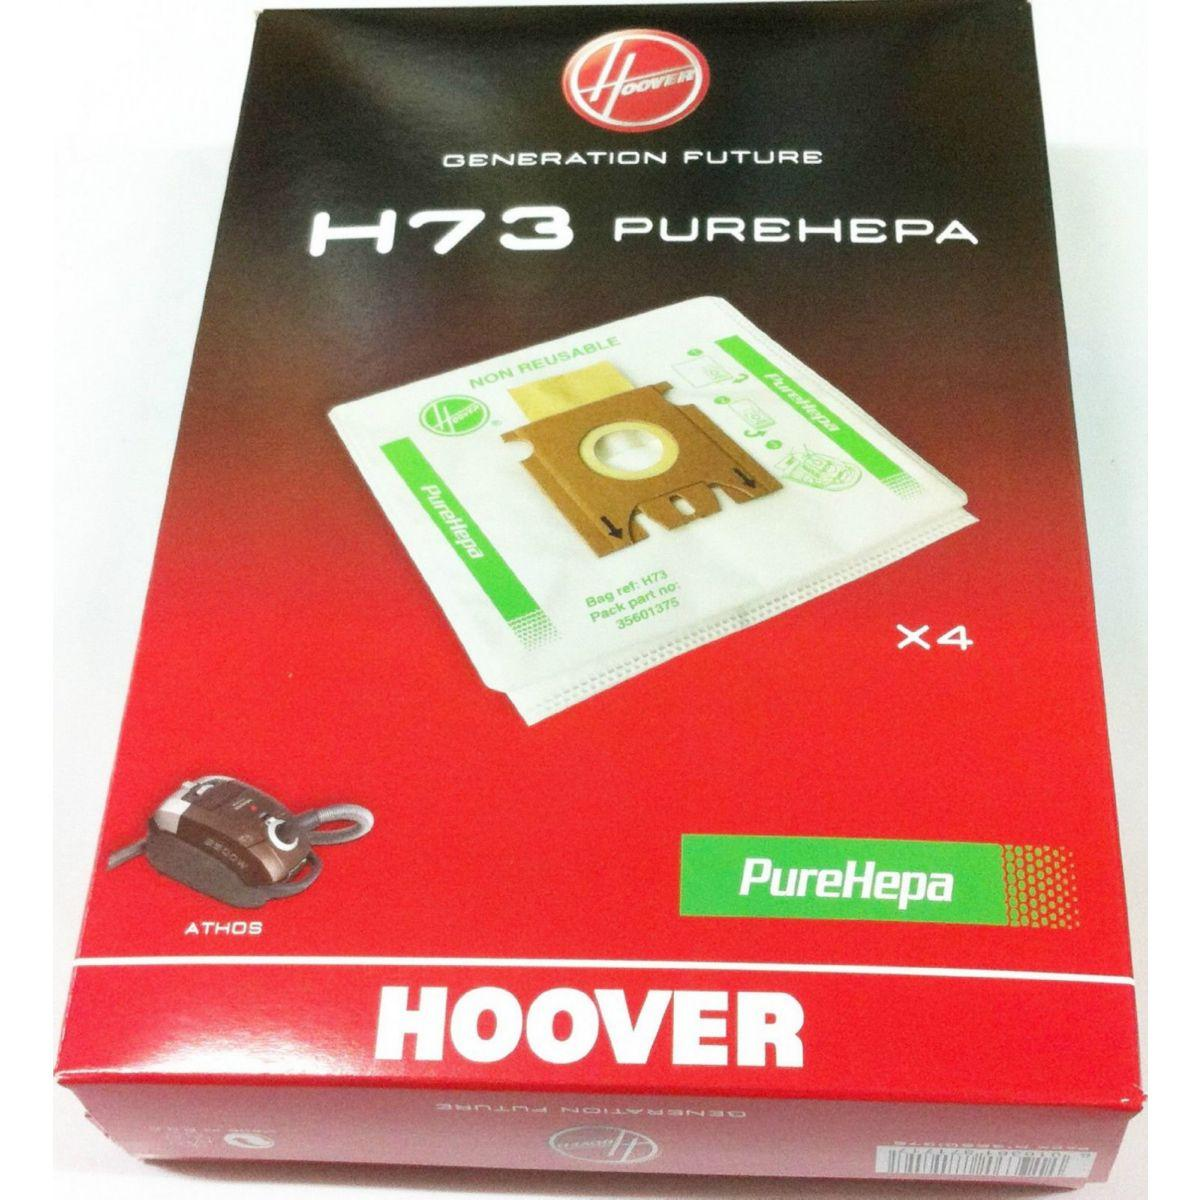 Sac aspirateur hoover h73 sac microfibre epa x4 - 20% de remise imm�diate avec le code :